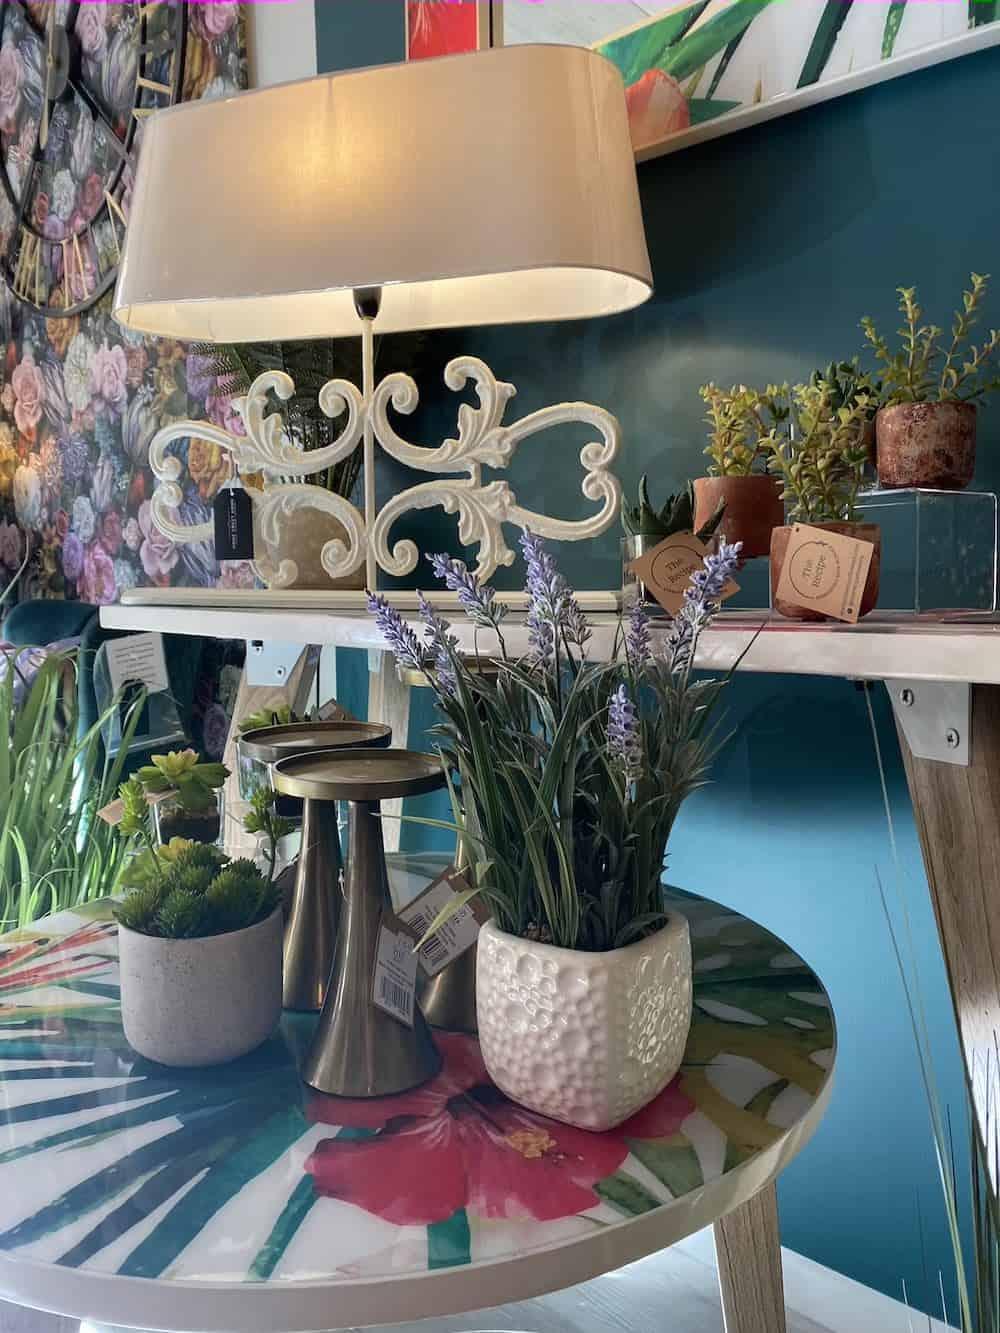 Home Sweet Home Barnstaple Homewares Shop Lamps